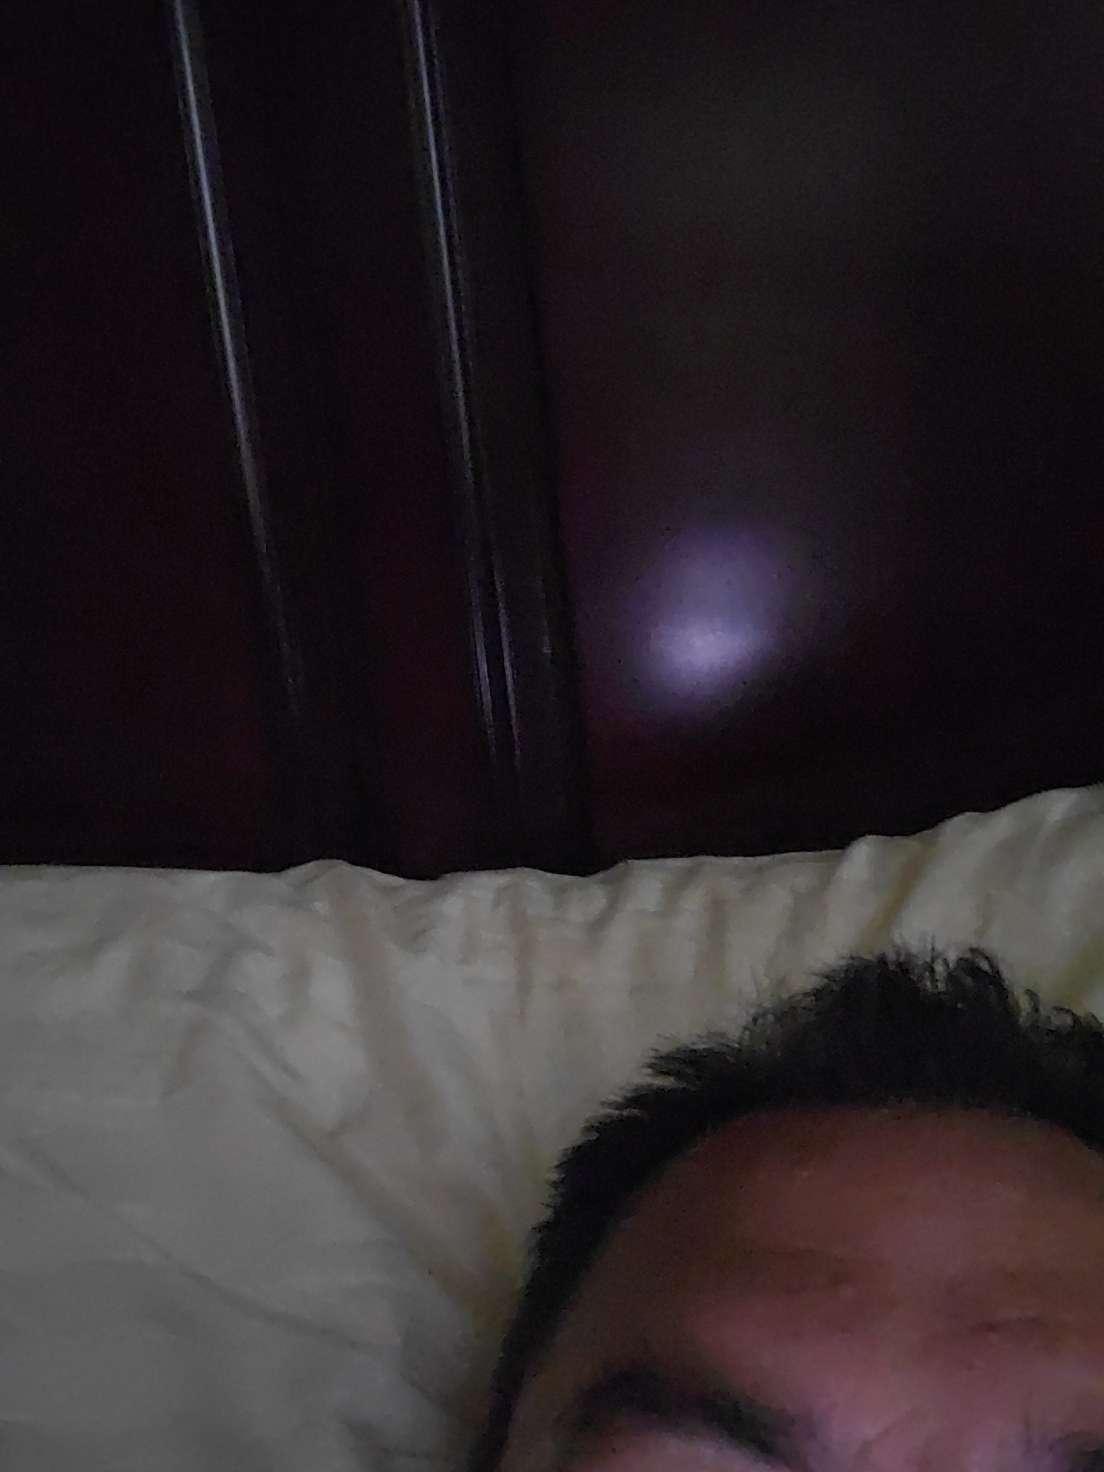 http://catch-app.oss-us-east-1.aliyuncs.com/image/78a46e2df63a70a36dc378c3b33866bc.jpeg